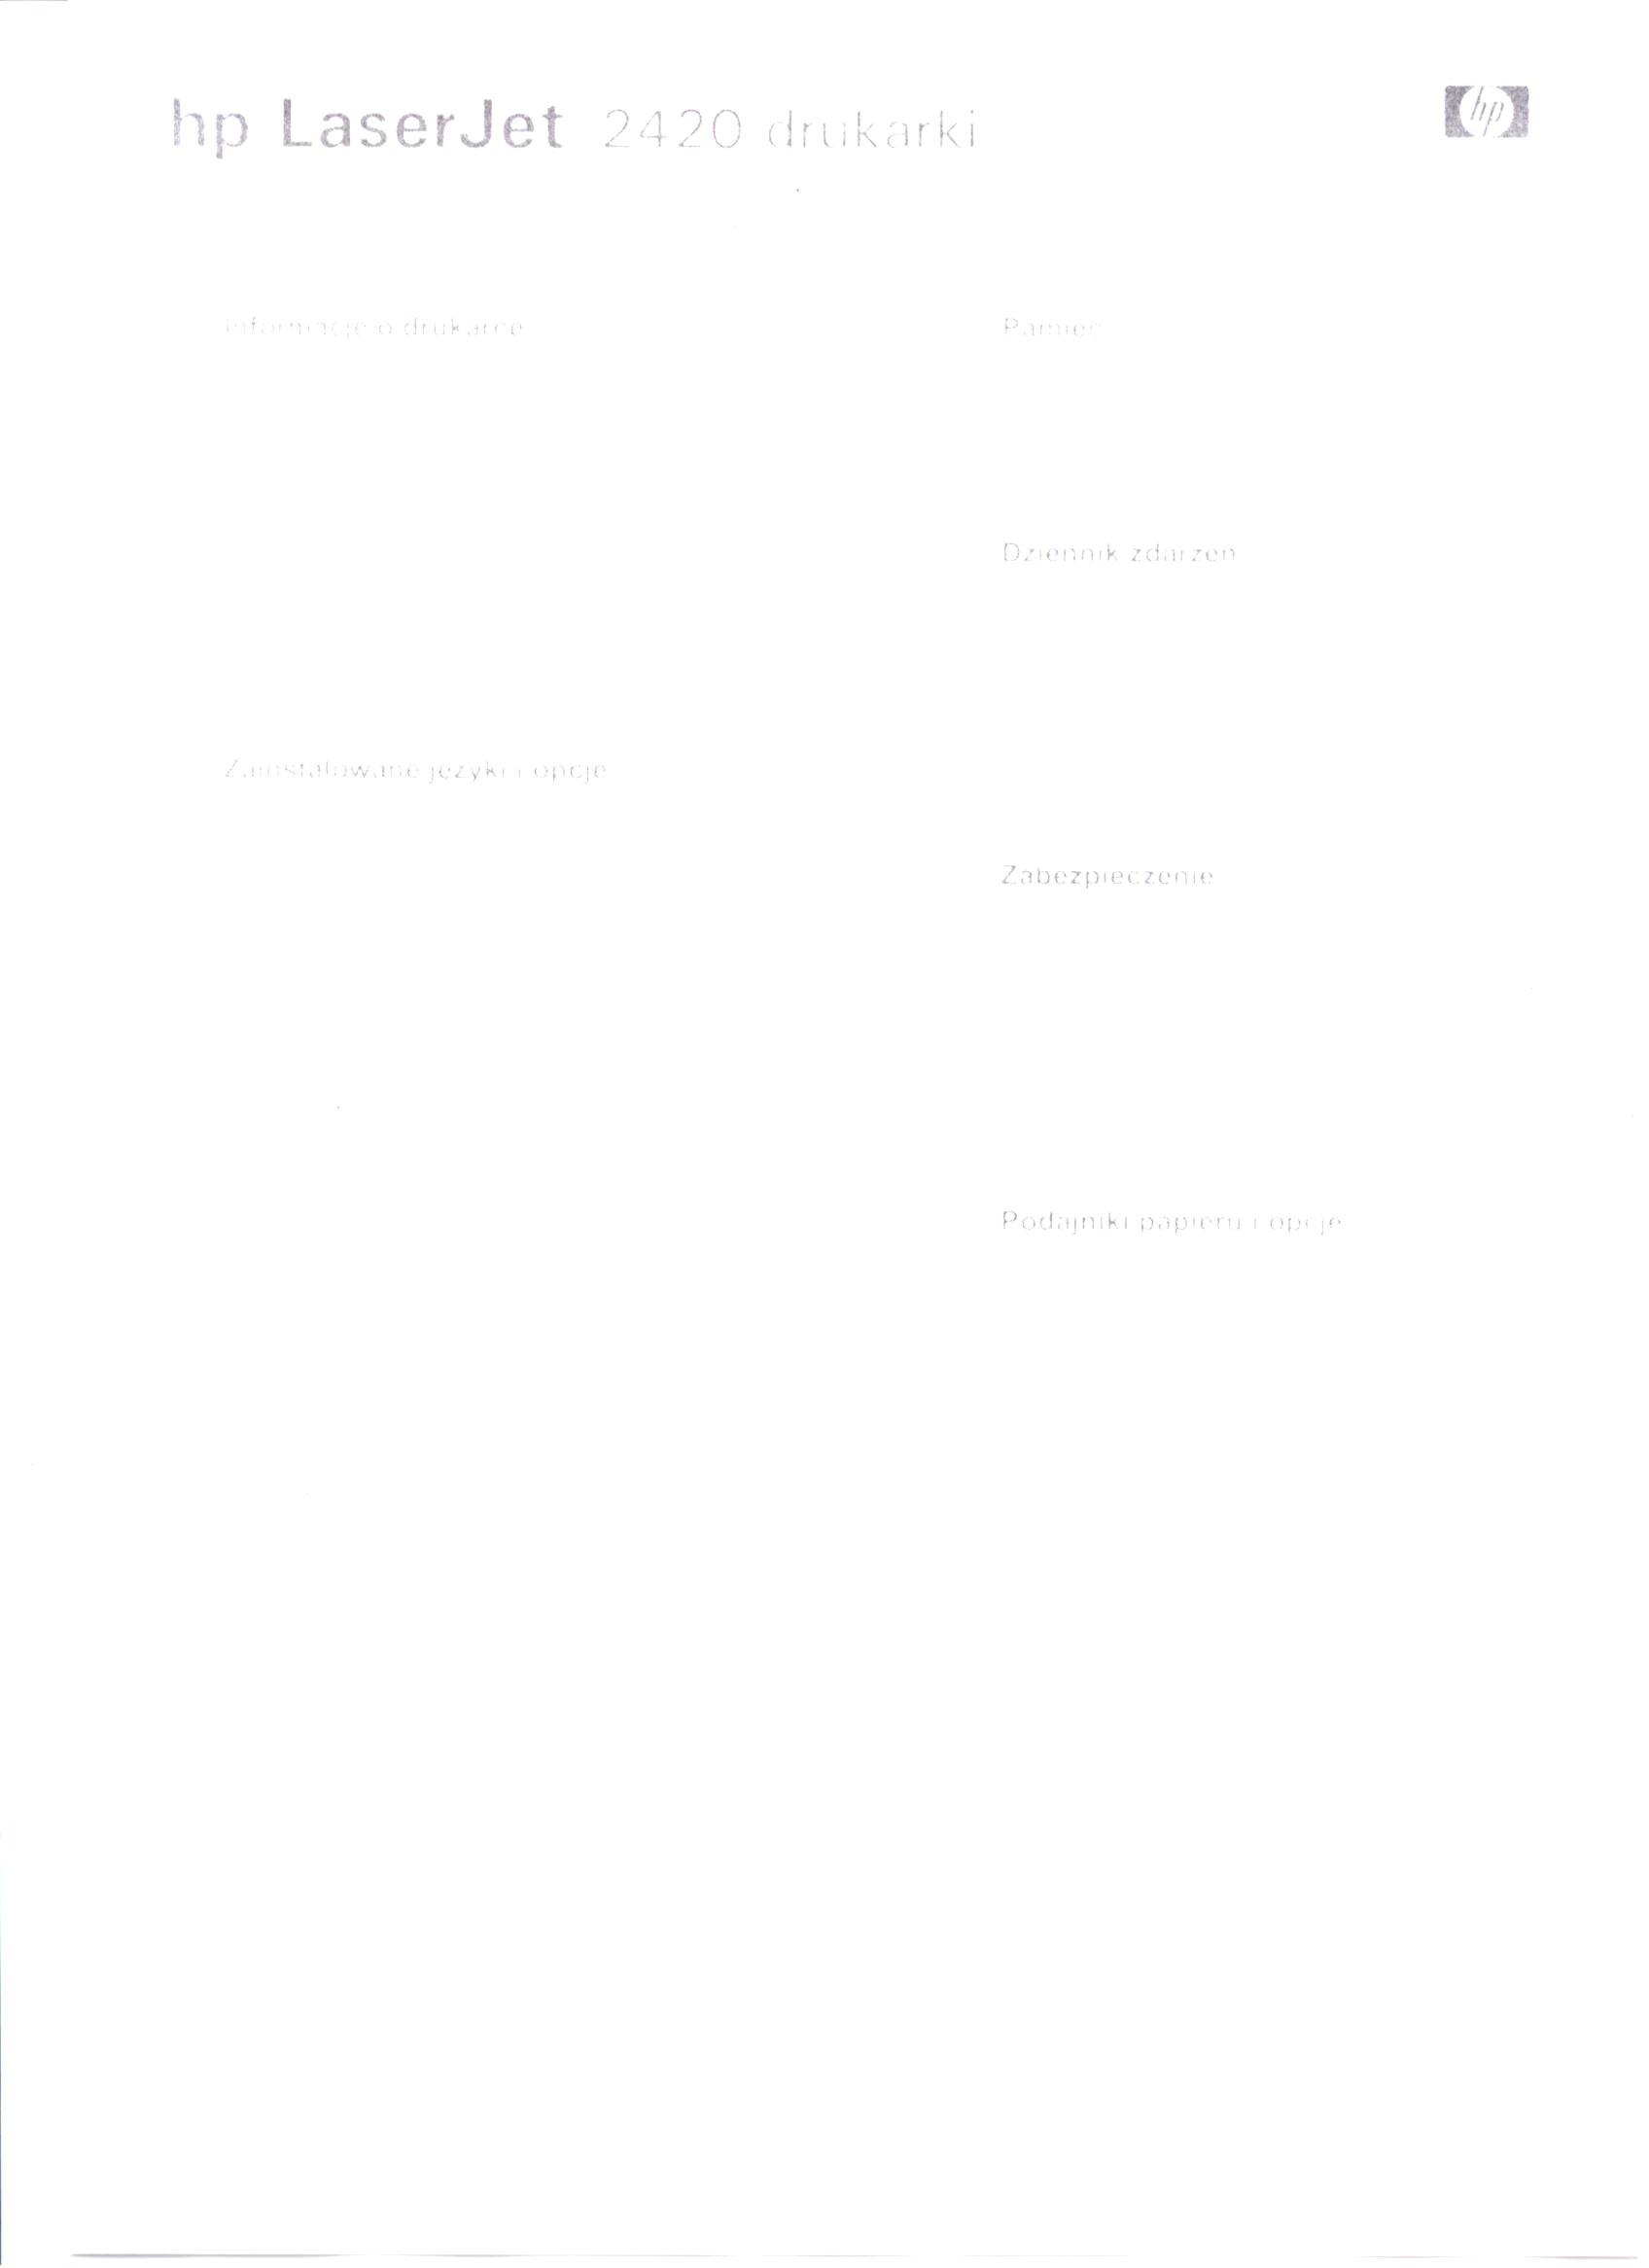 HP LJ 2420dn - Blade wydruki, wina tonera wykluczona